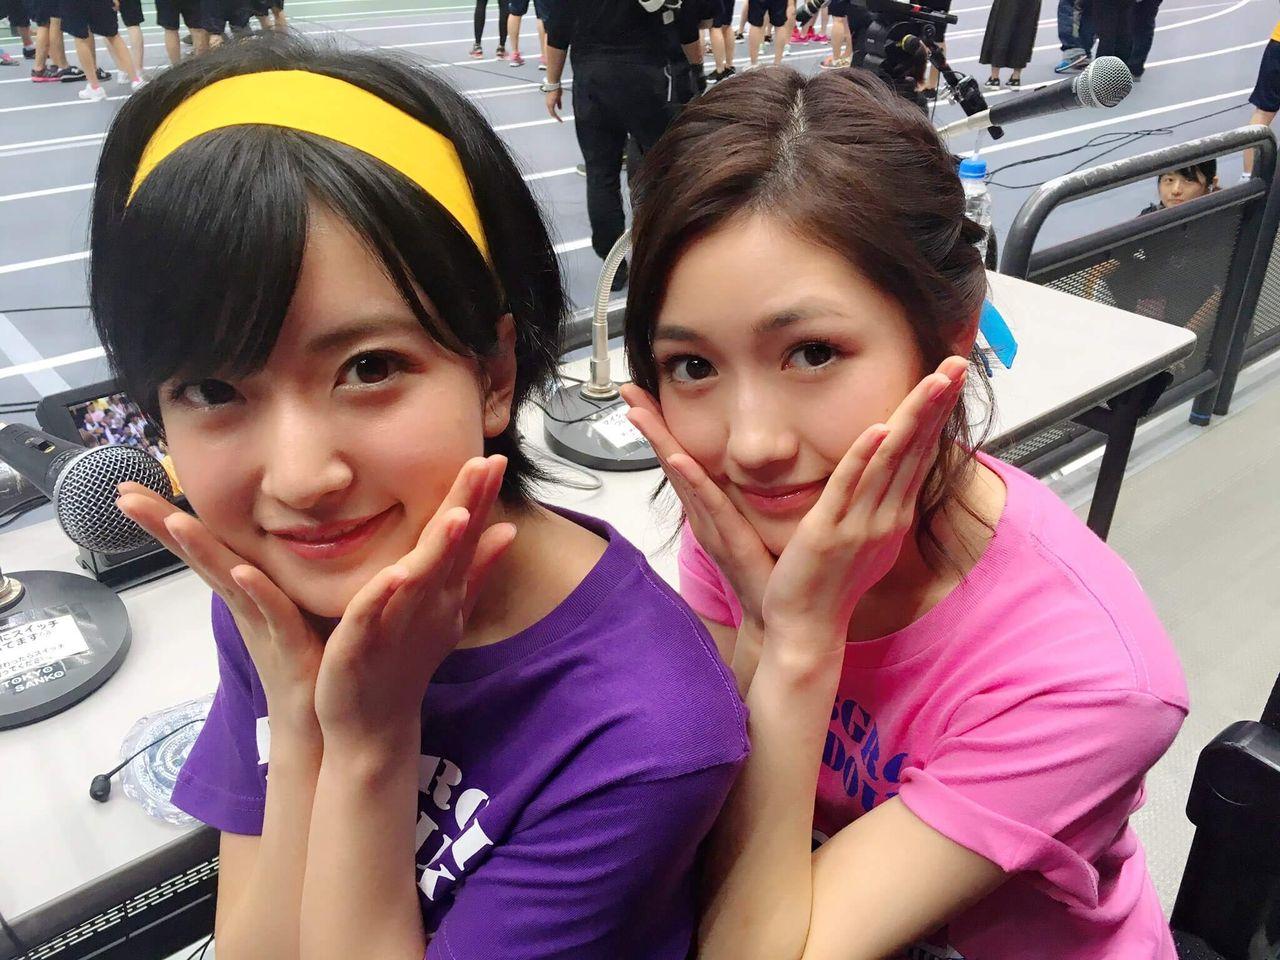 【AKB48】「邪魔な芸能人は誰?」→須藤凜々花さんの回答wwwwww